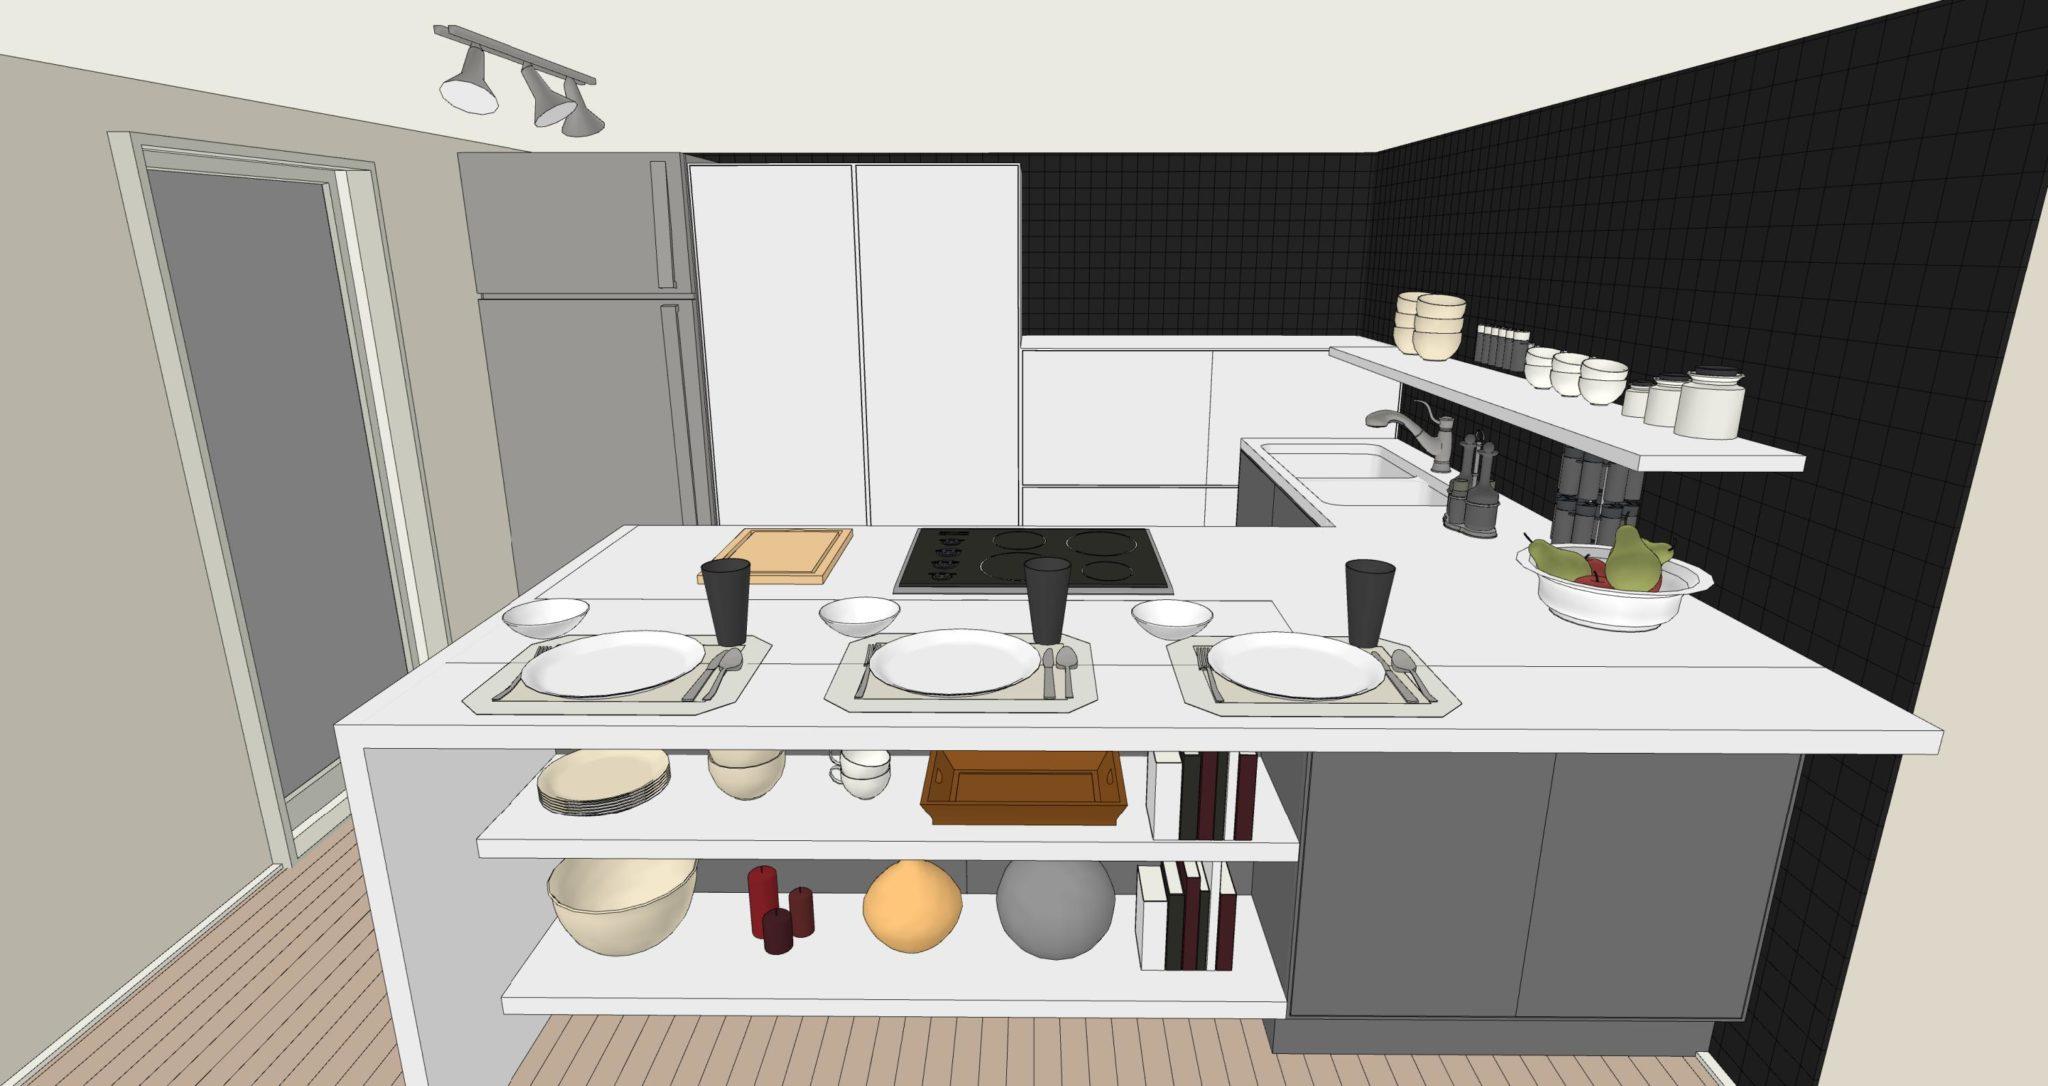 Cucina archivi michele de biase - Profondita pensili cucina ...